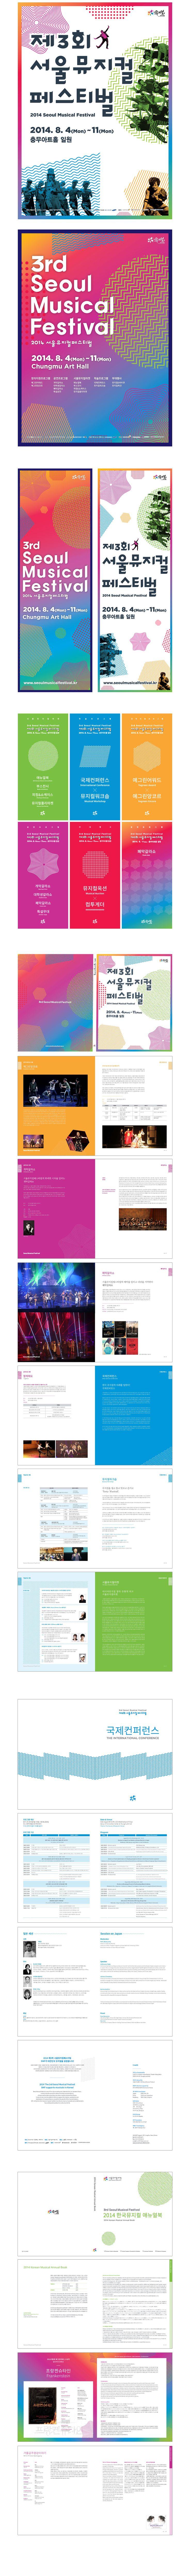 2014 seoul musical festival. graphic identity. 제3회 서울 뮤지컬 페스티벌